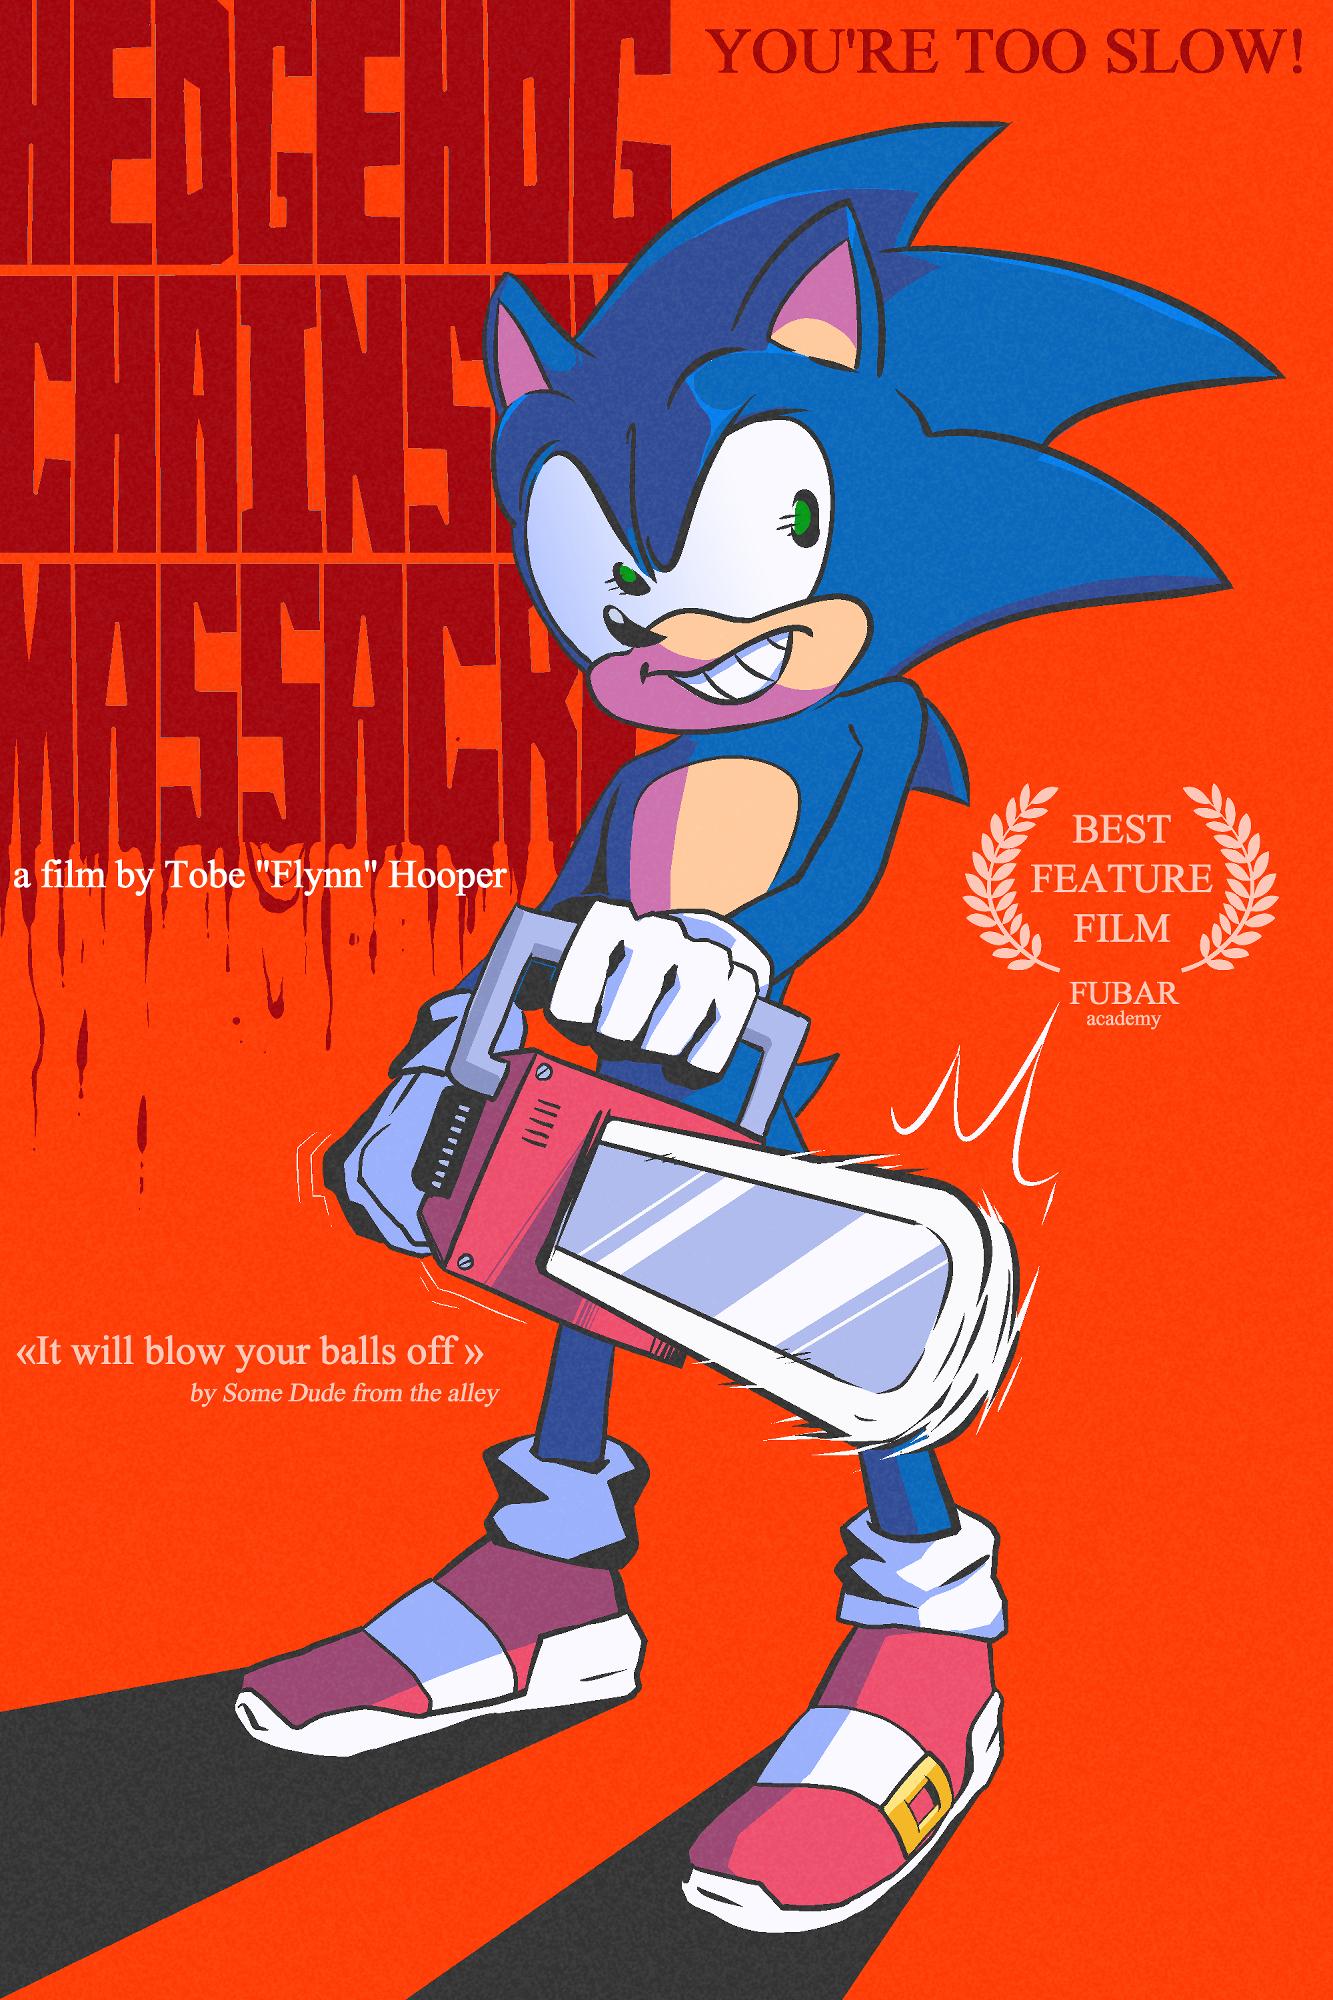 The Hedgehog Chainsaw Massacre